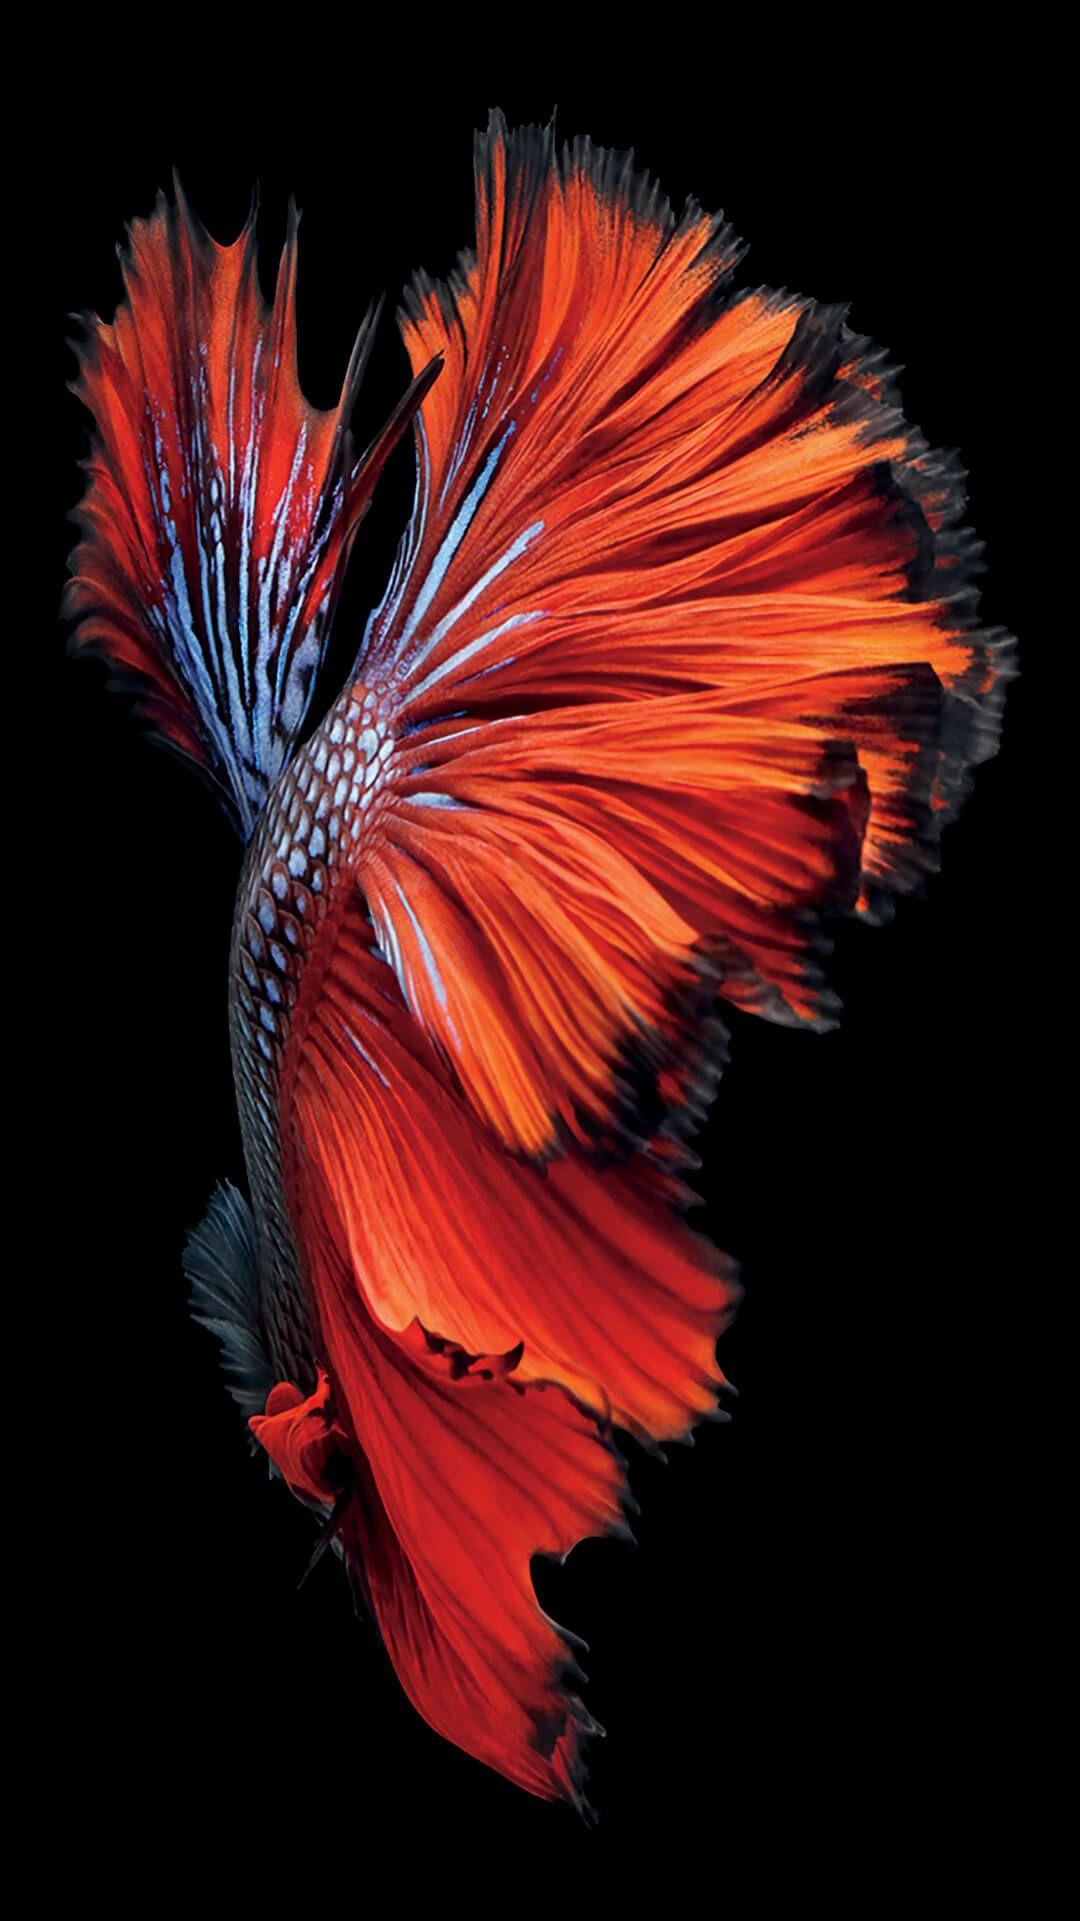 Pin by Robynn Wells on Bettas   Pinterest   Betta, Fish and Betta fish